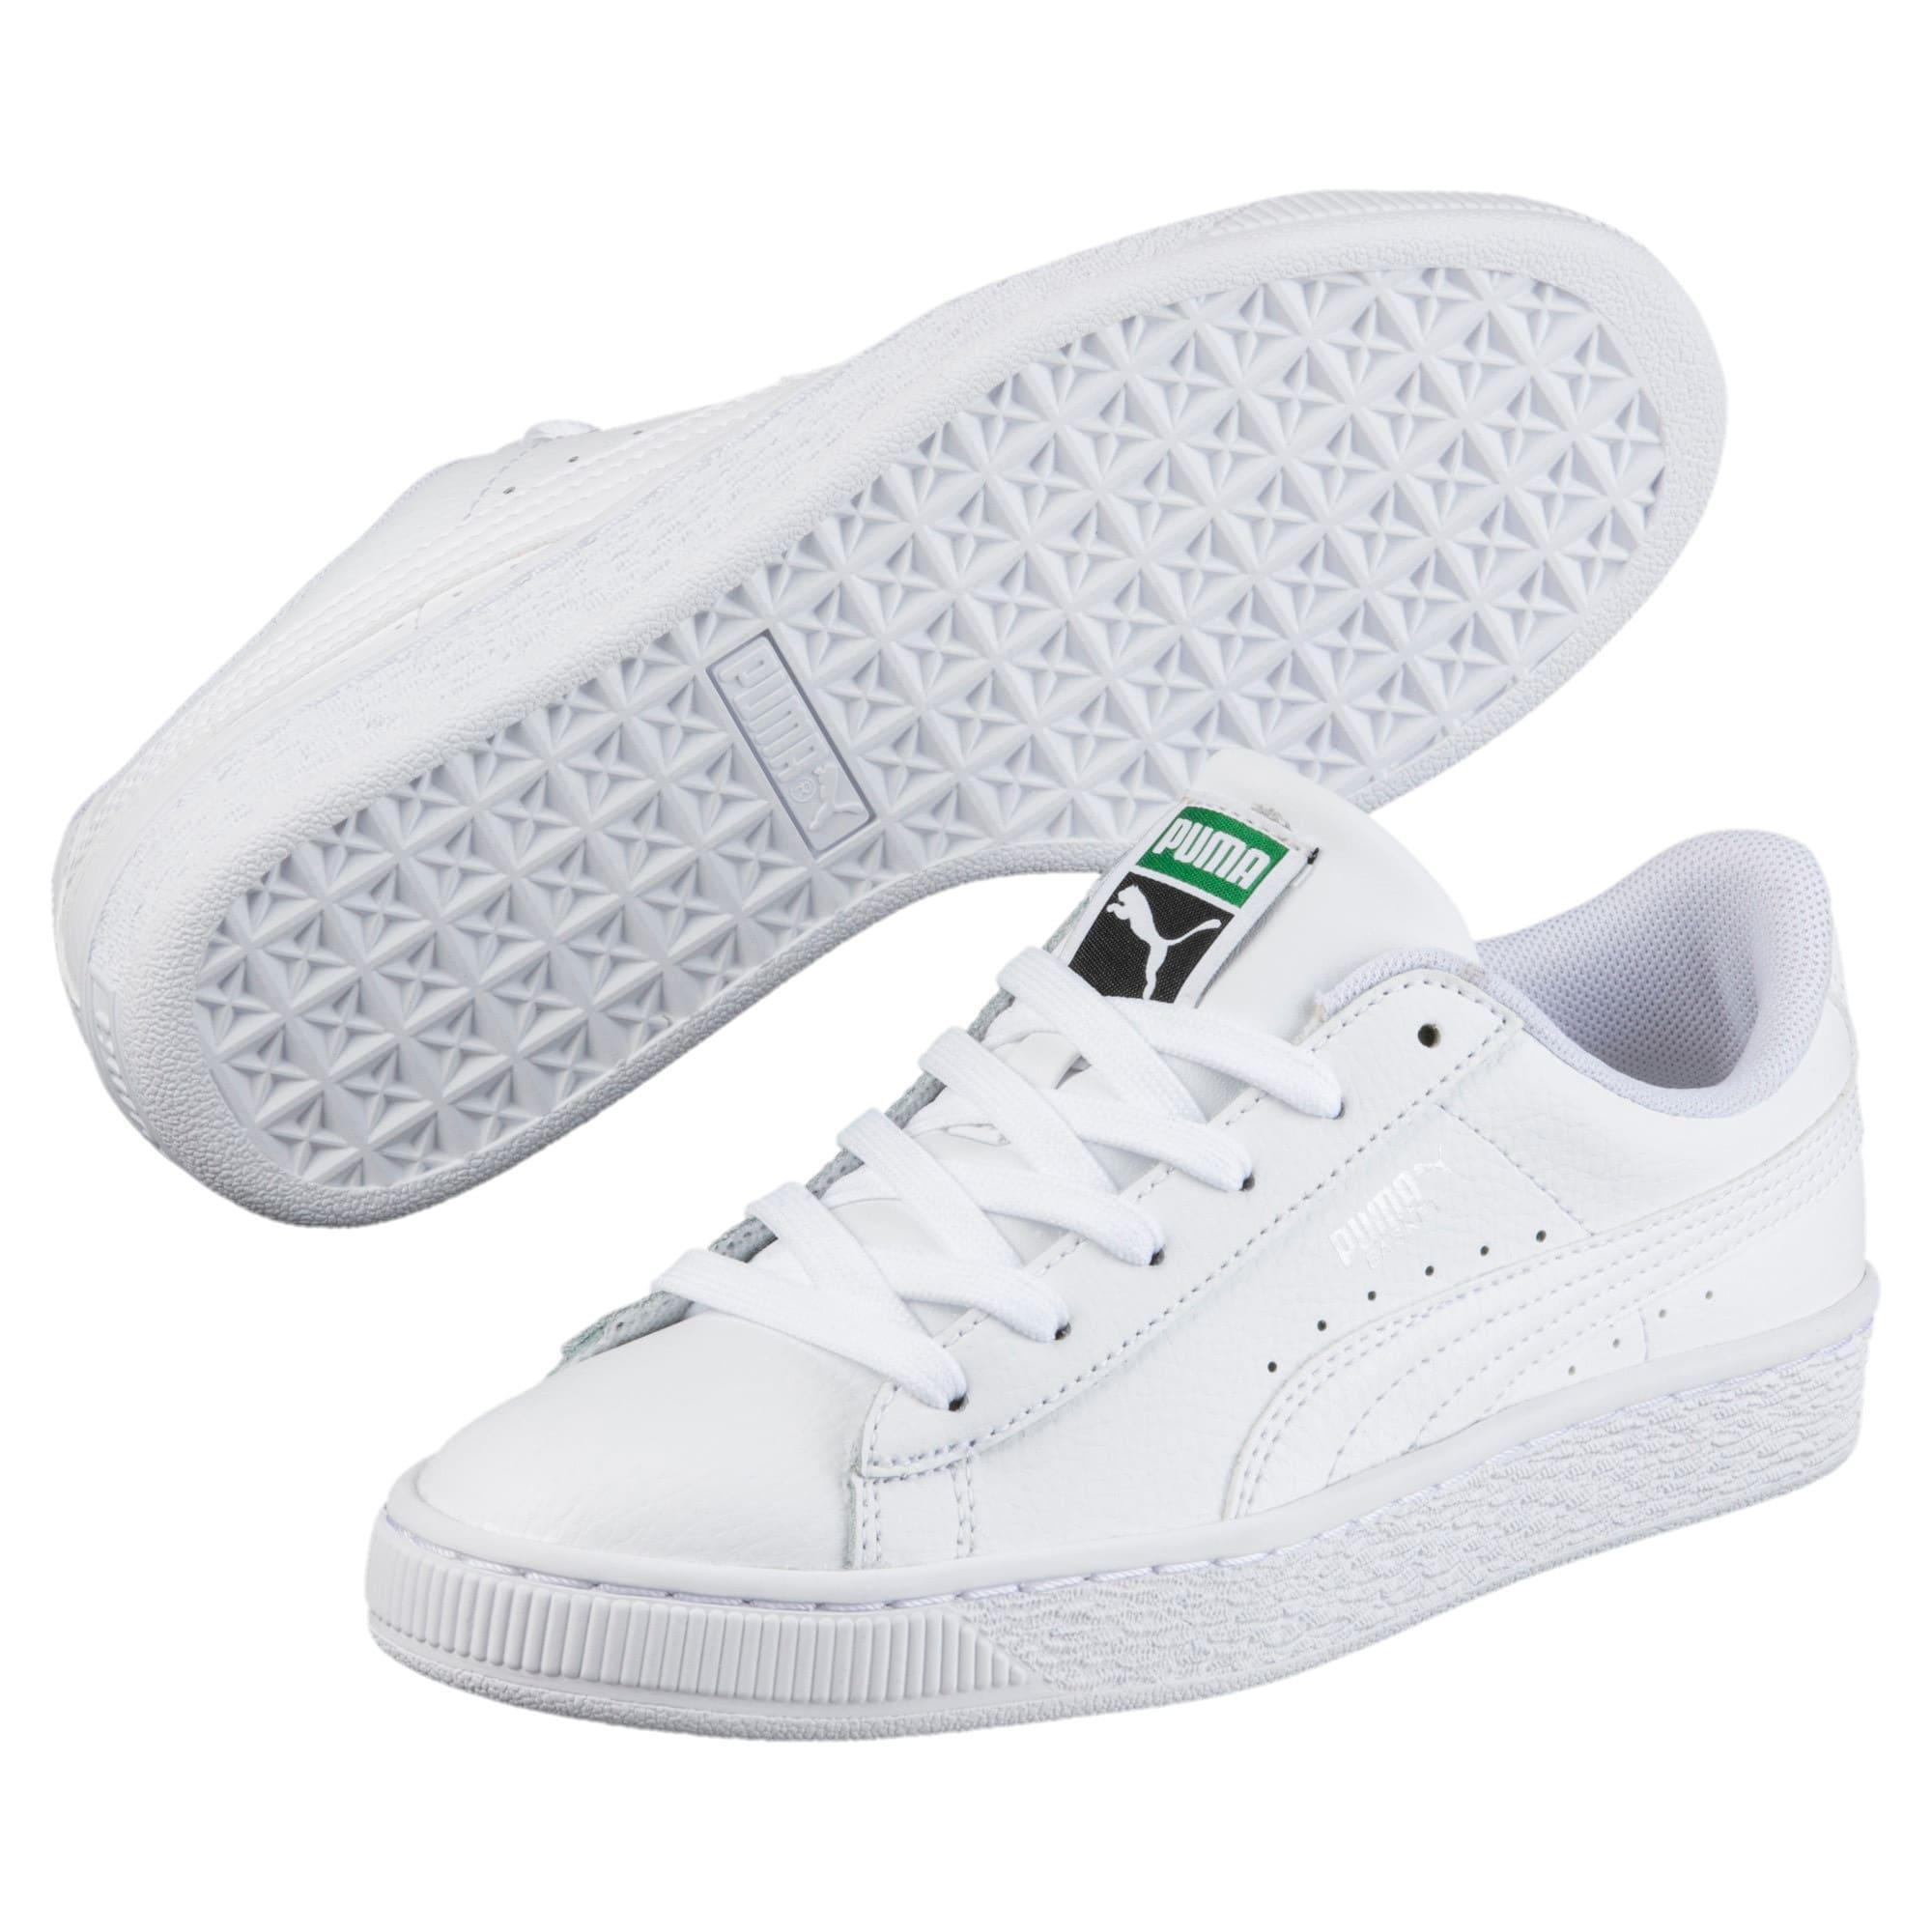 Thumbnail 2 of Basket Classic Little Kids' Shoes, Puma White-Puma White, medium